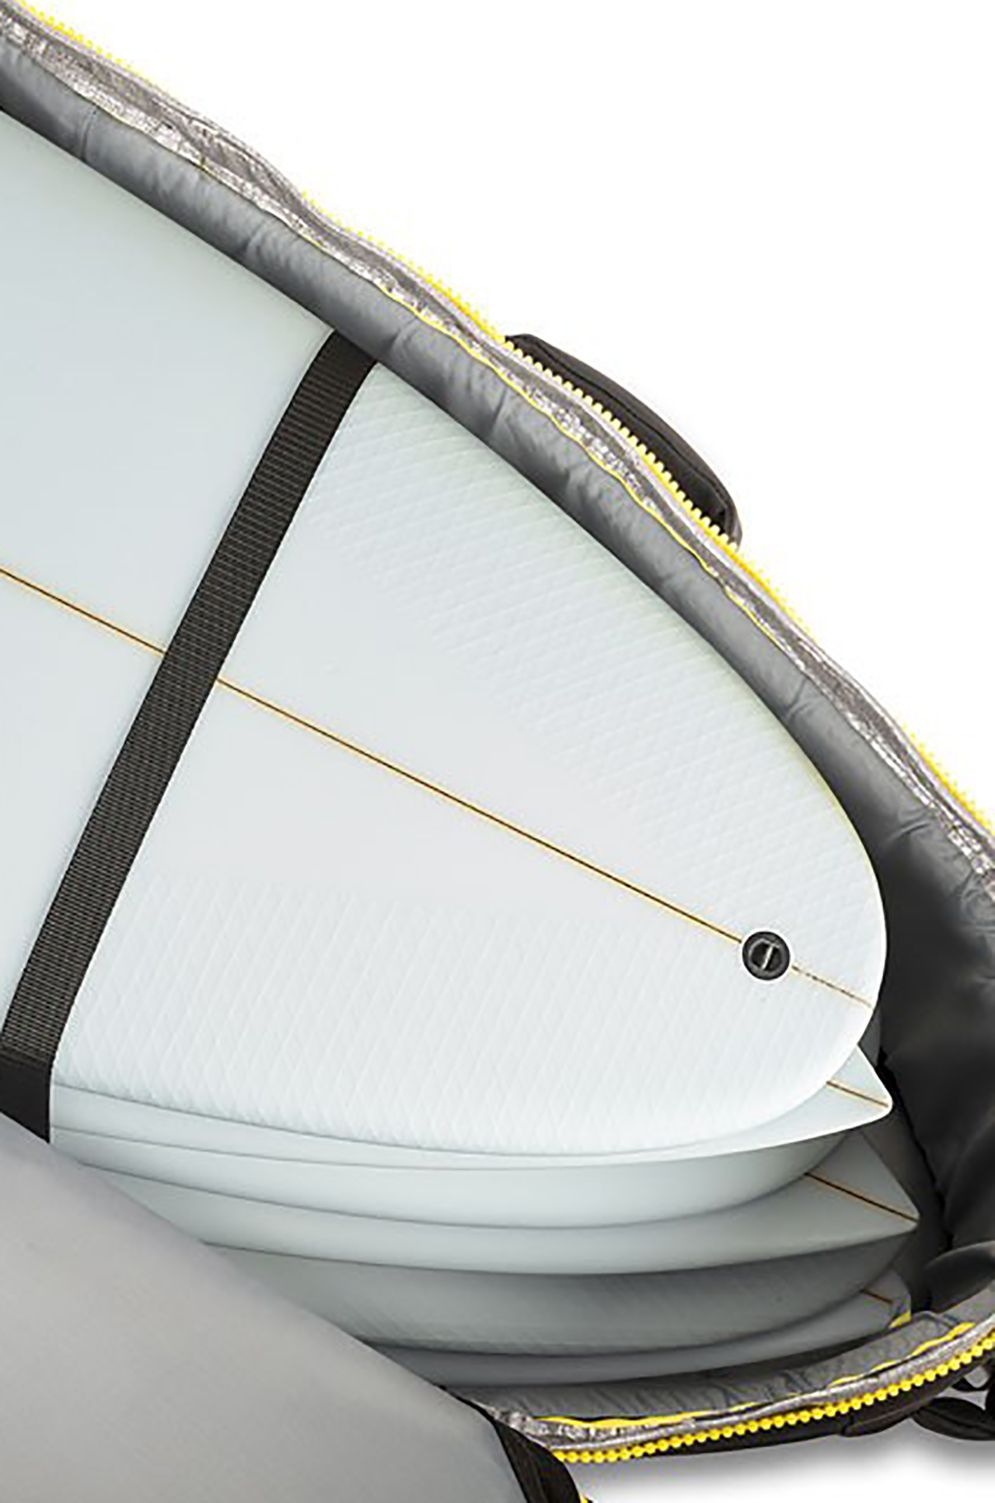 Capa Dakine TOUR REGULATOR SURFBOARD BAG Carbon